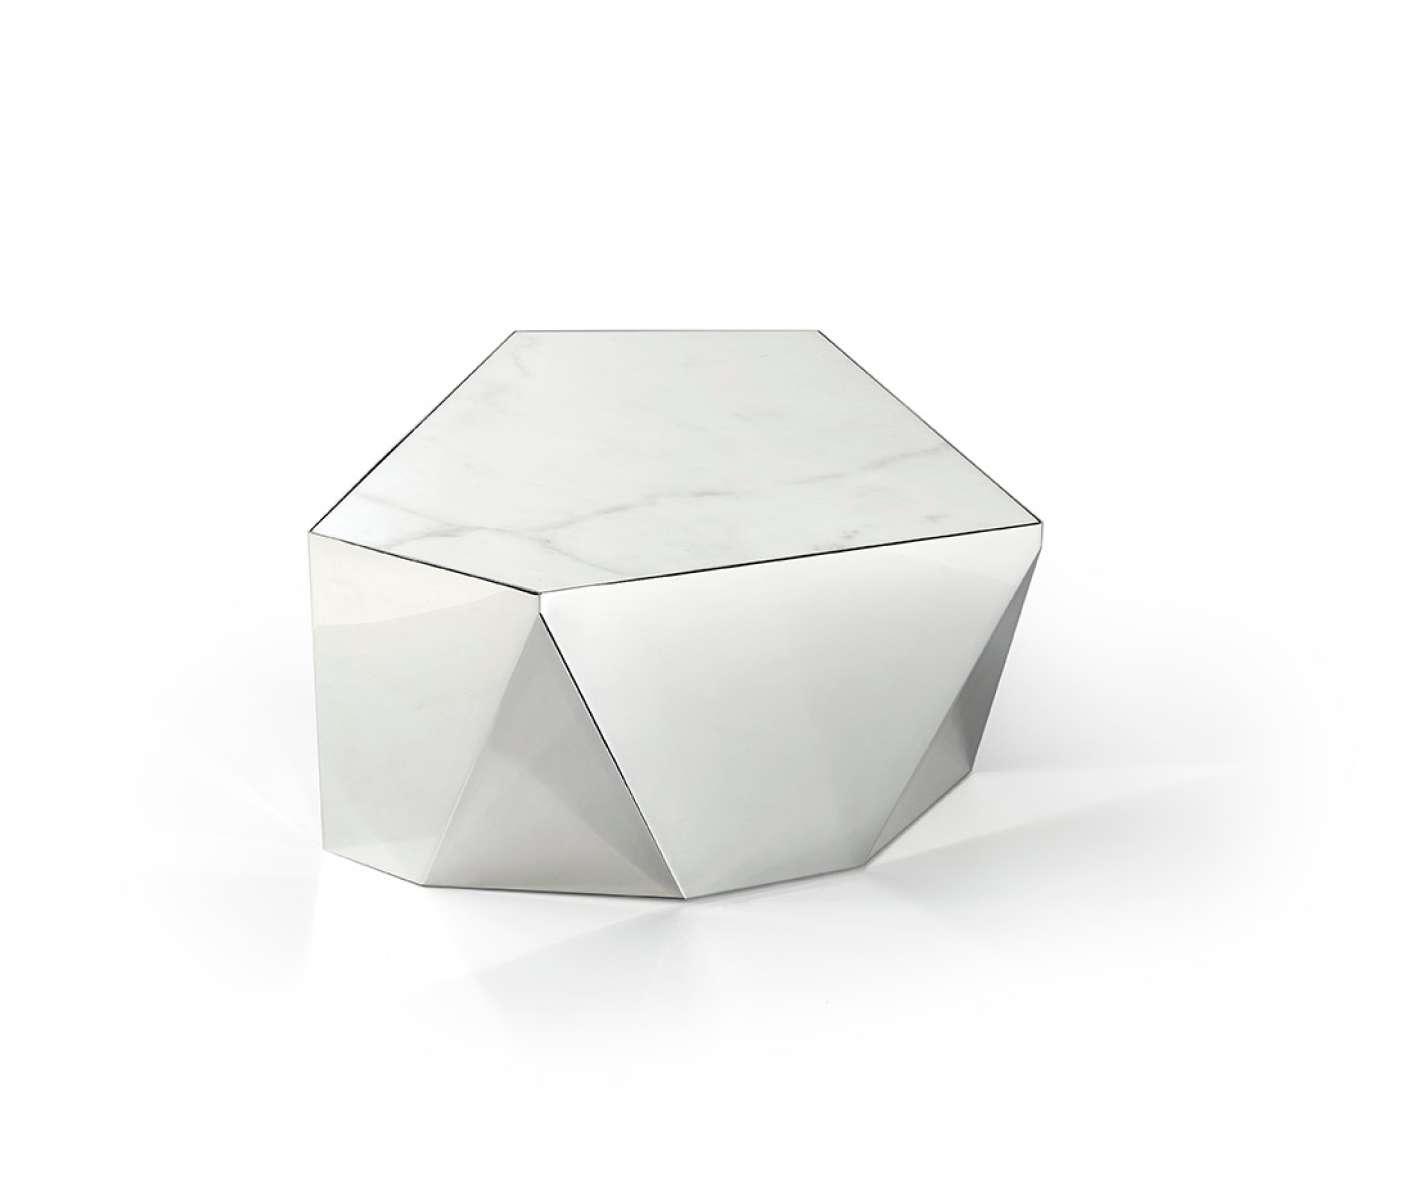 Studio Marco Piva – Product design – 405